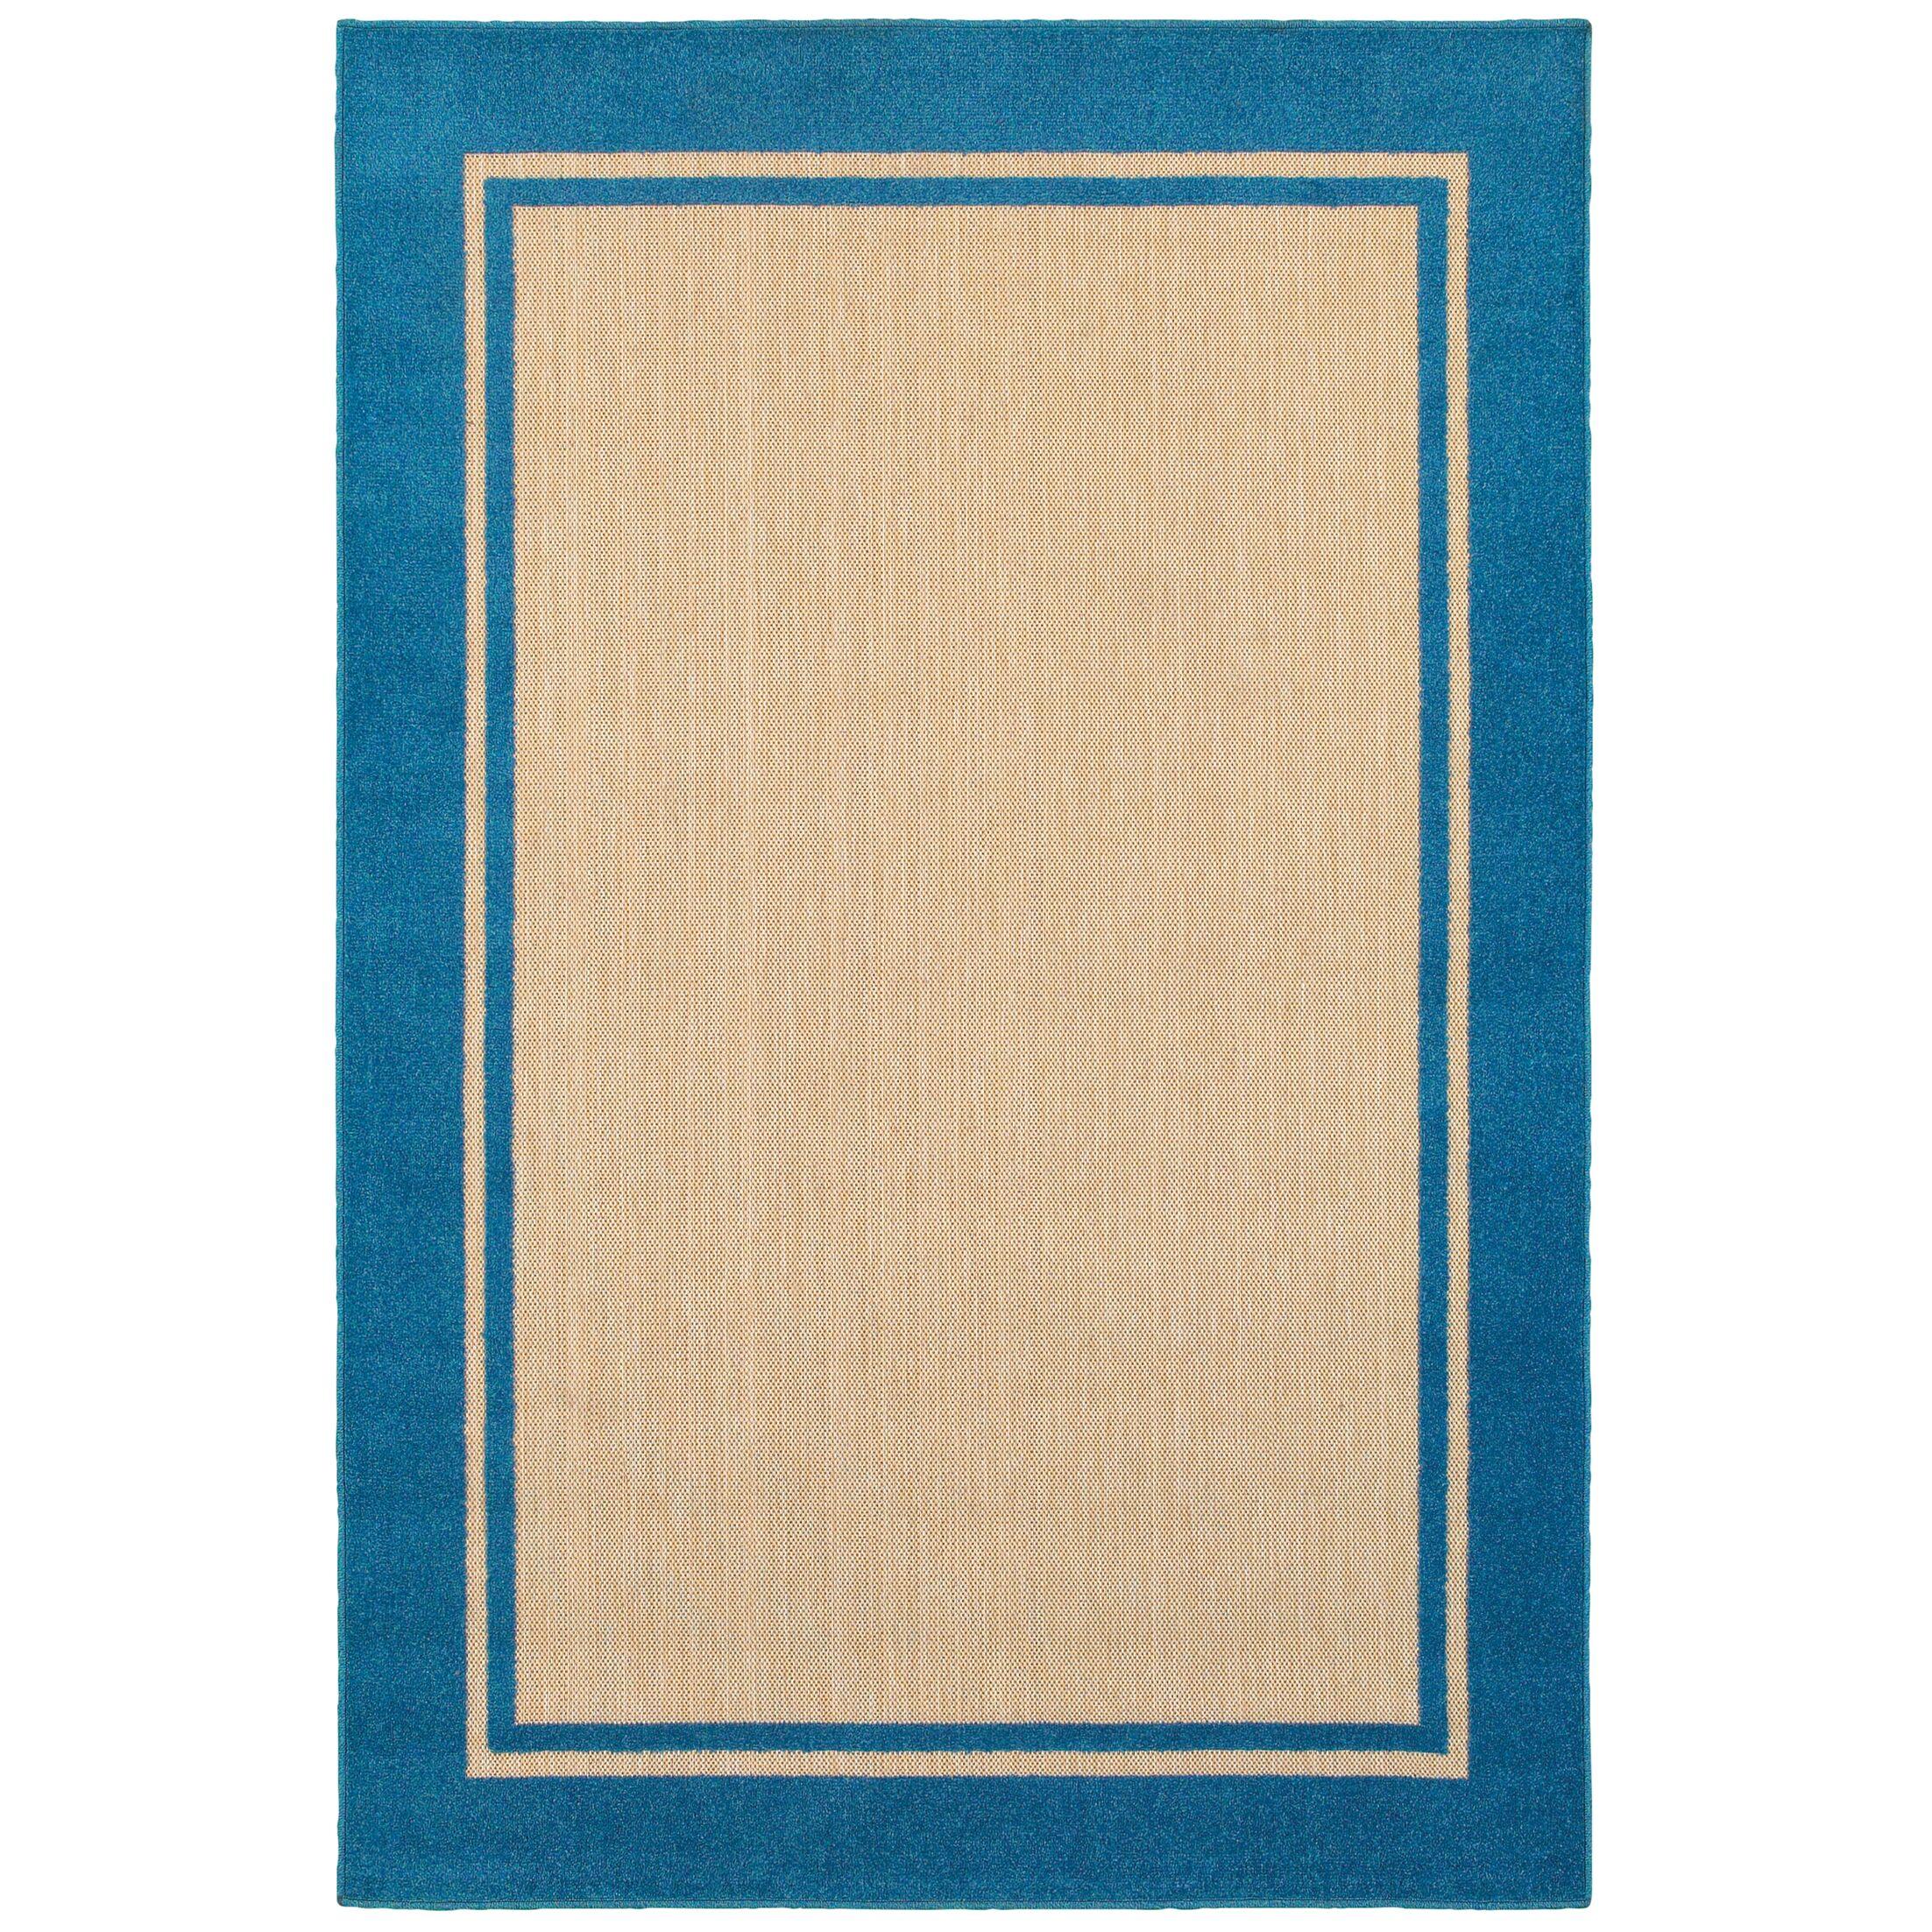 Binghamton Sand/Blue Outdoor Area Rug Rug Size: Rectangle 3'10